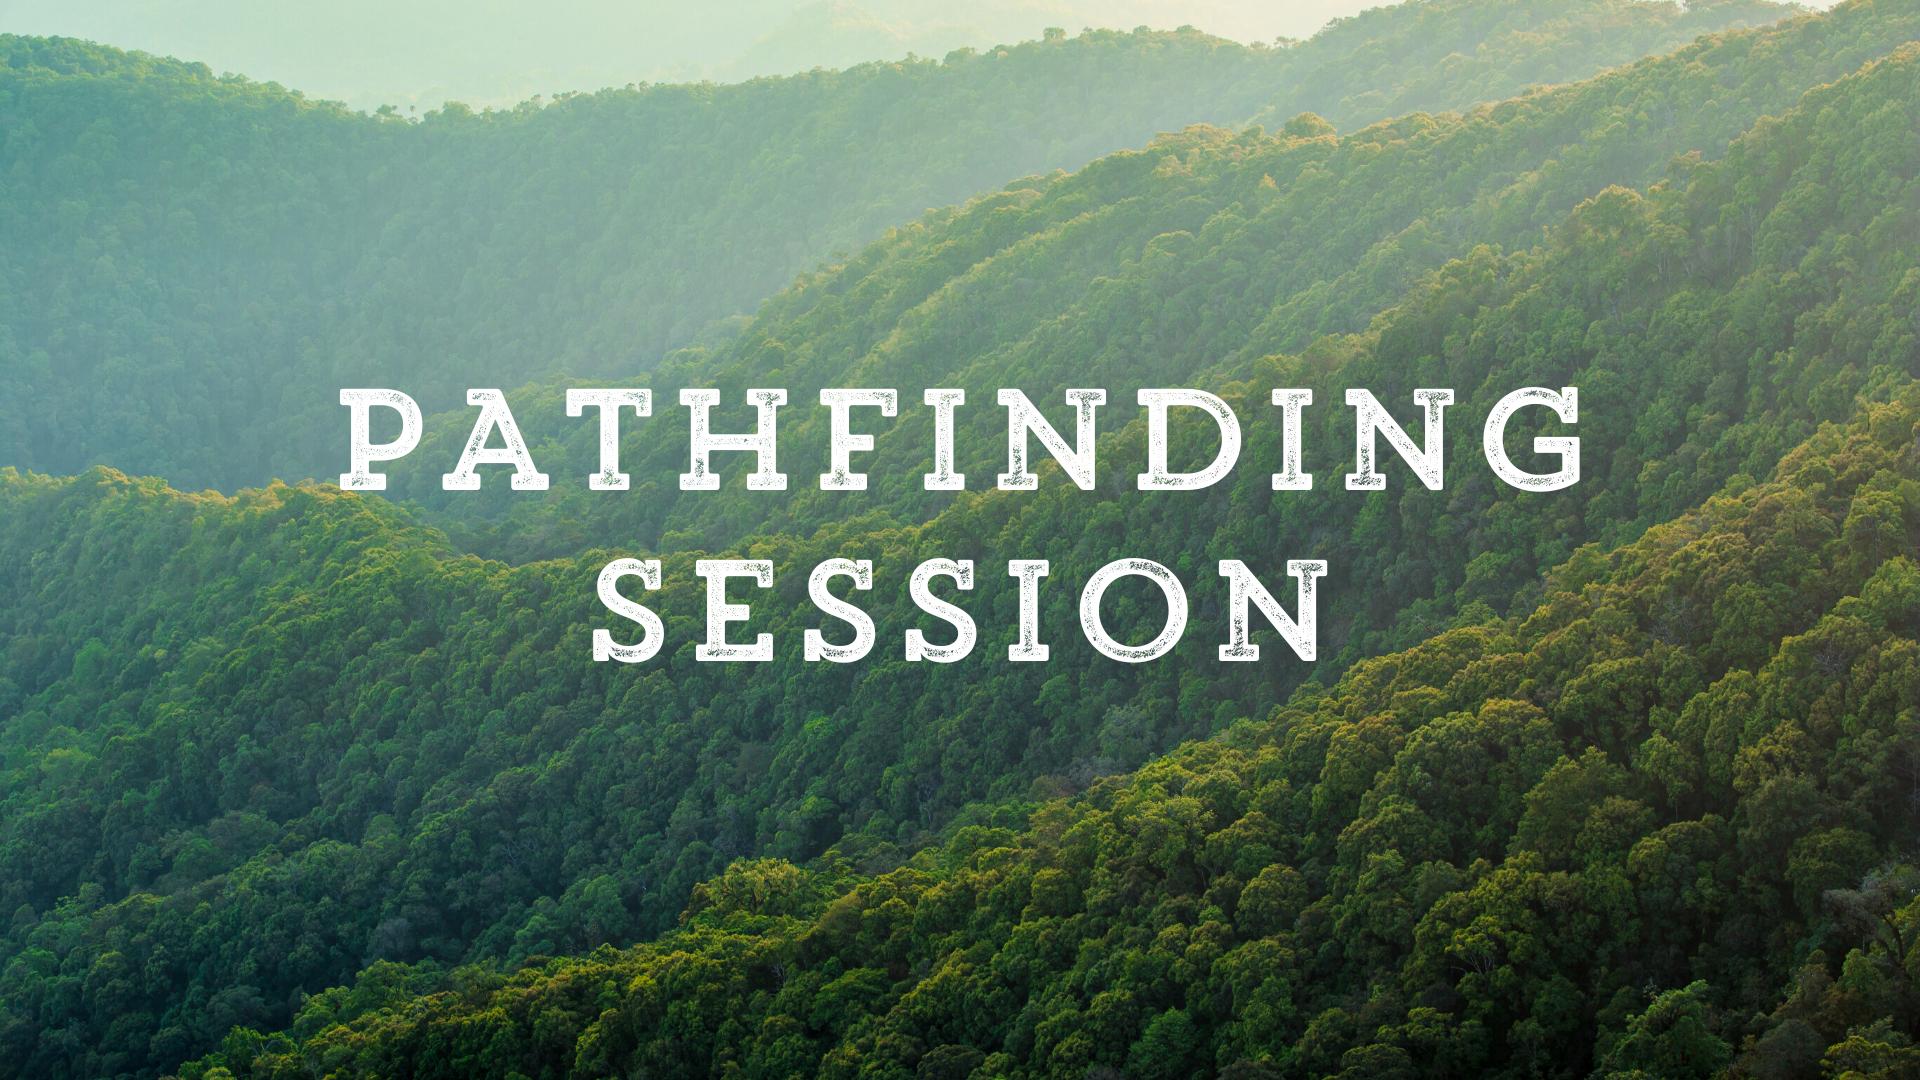 Pathfinding Session